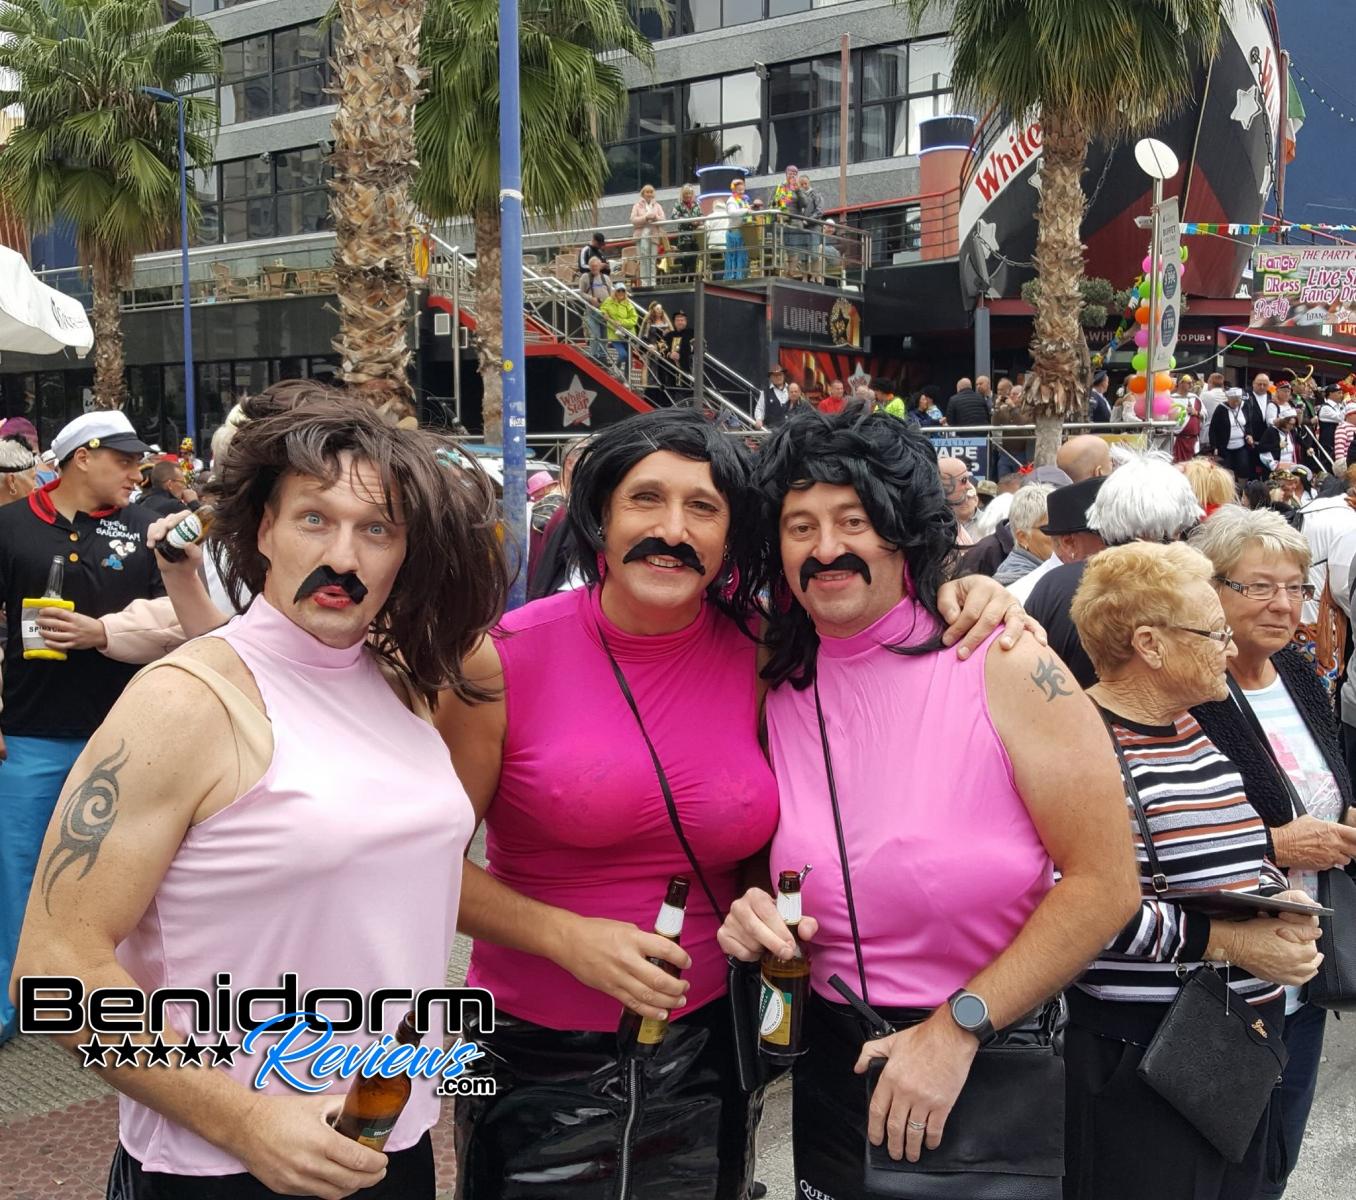 Benidorm-Fiestas-2019-Fancy-Dress-63